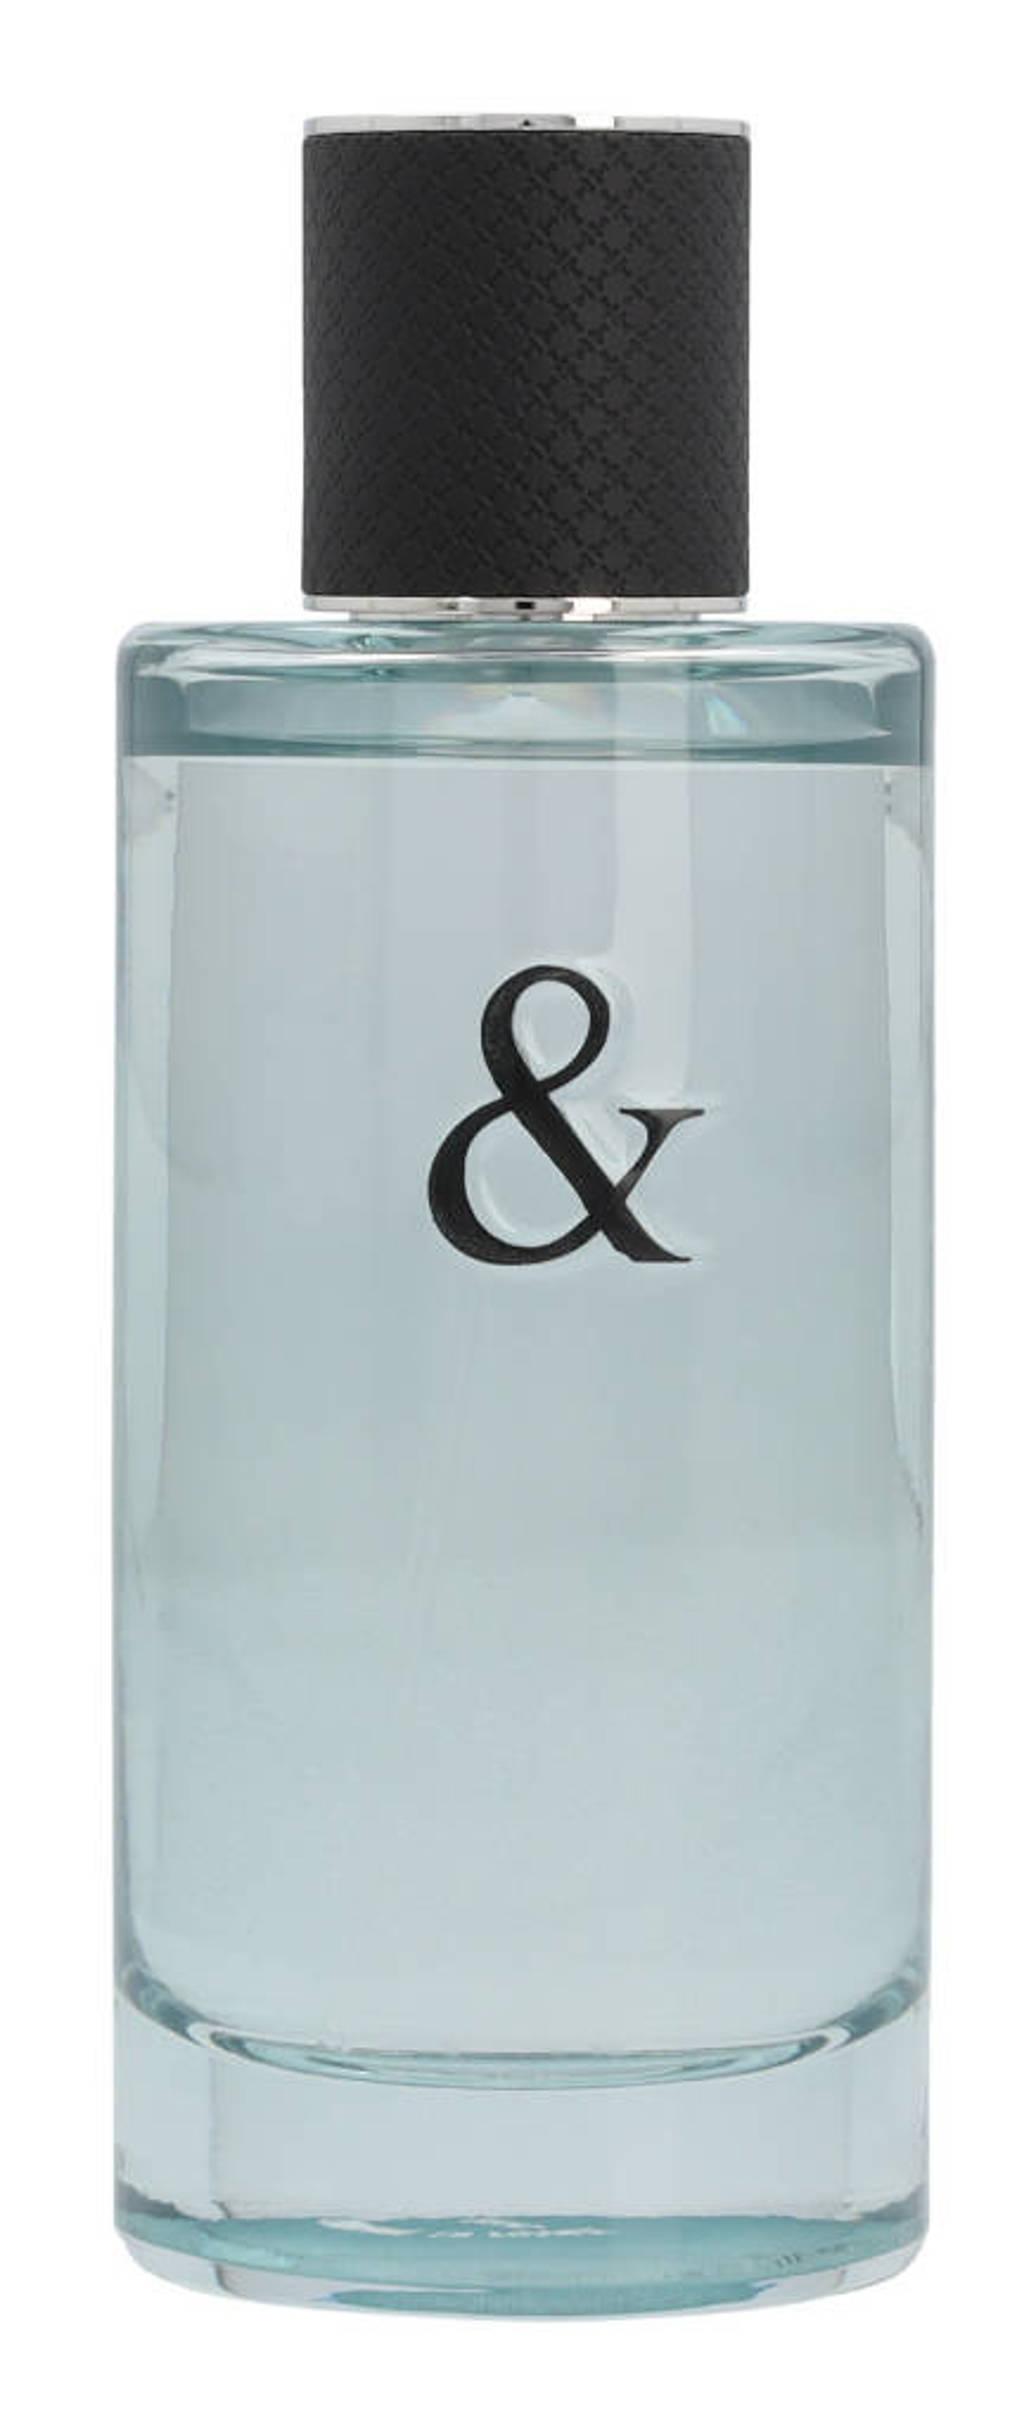 Tiffany & Co. Love Him eau de toilette - 90 ml